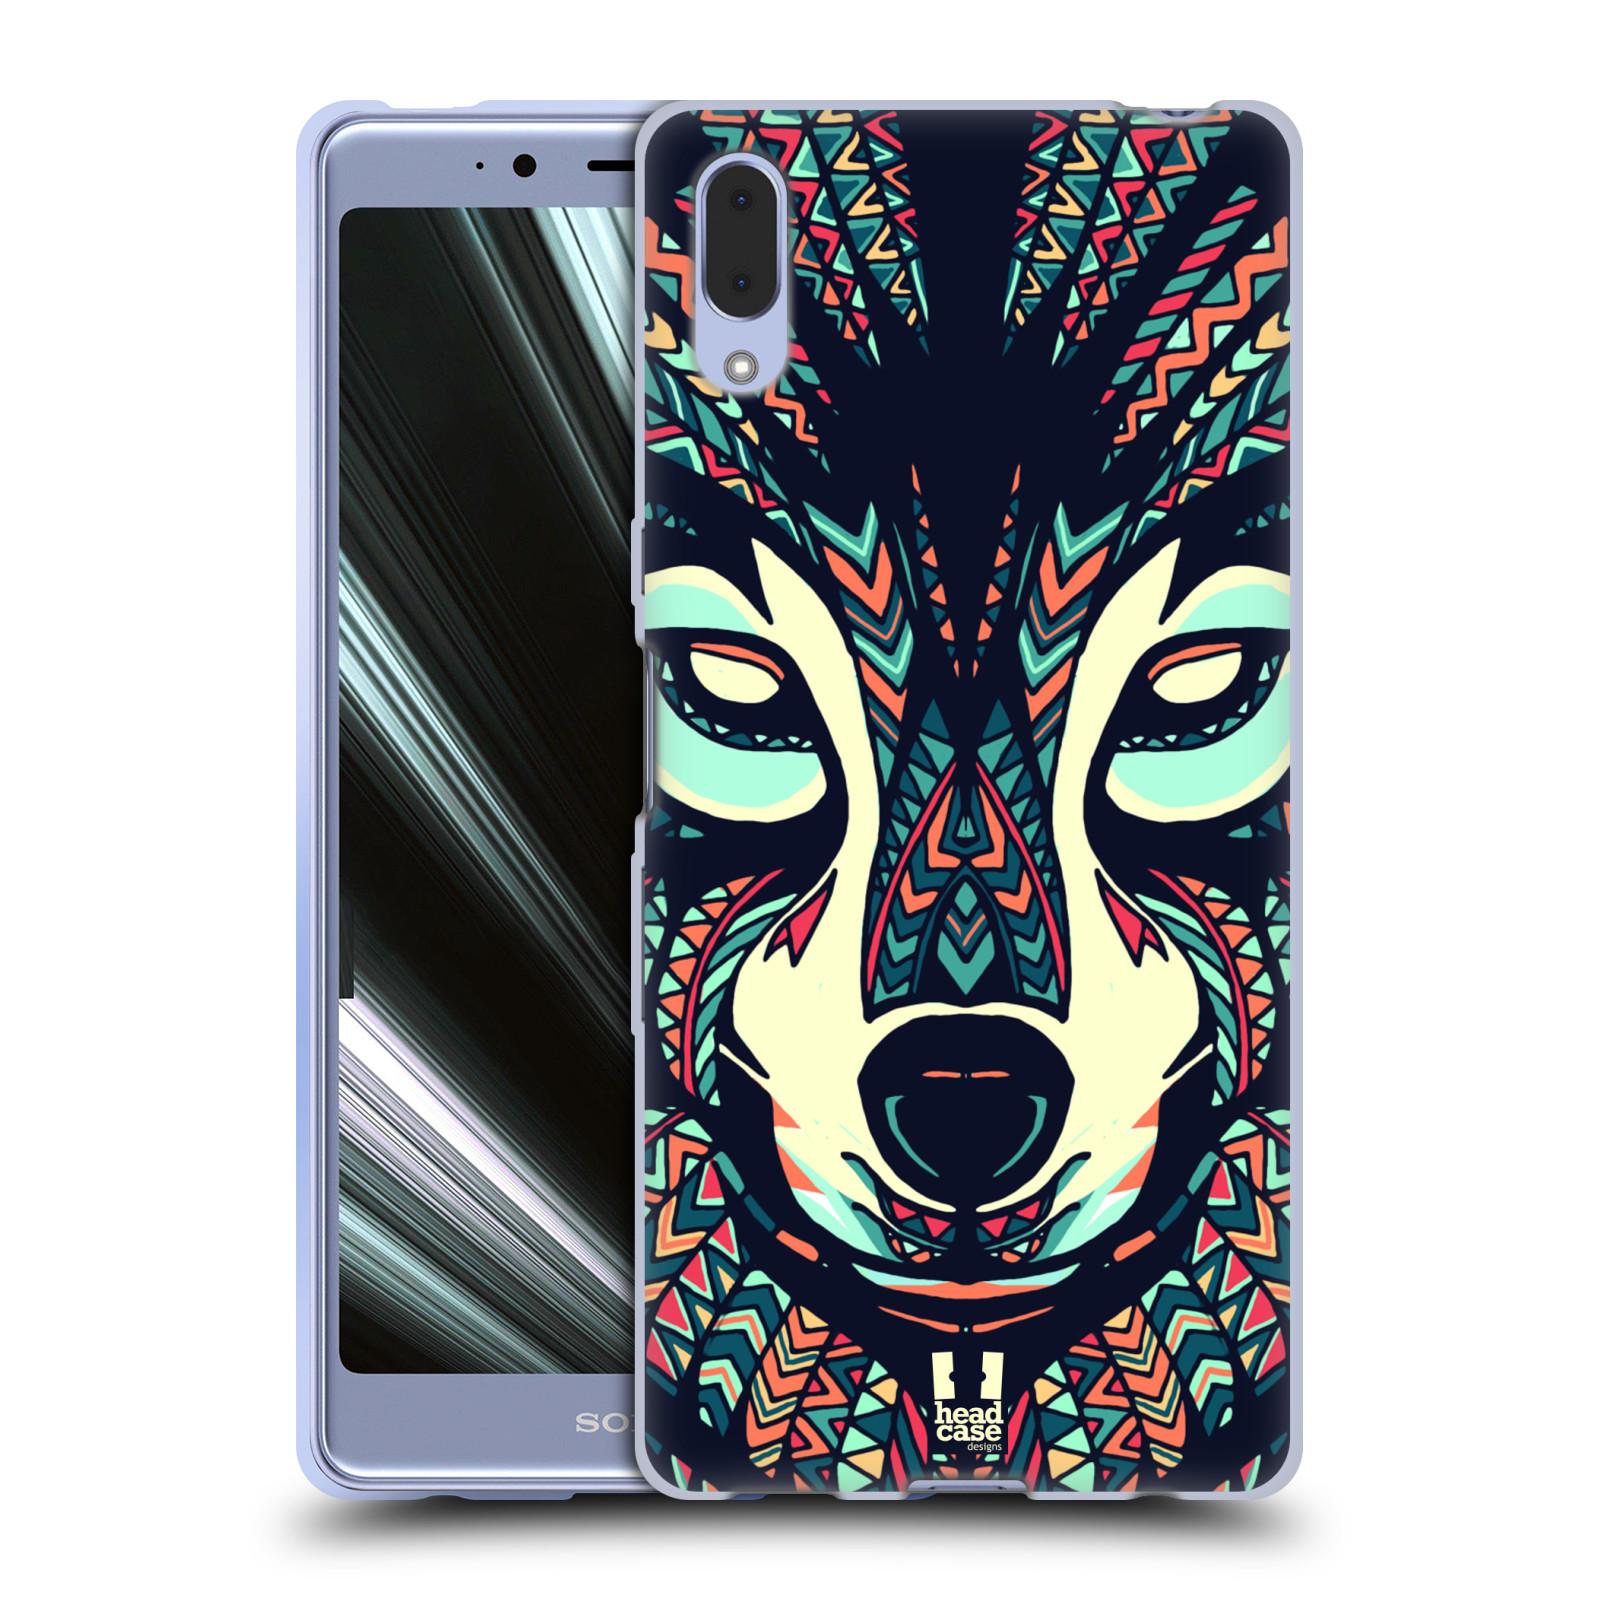 Silikonové pouzdro na mobil Sony Xperia L3 - Head Case - AZTEC VLK